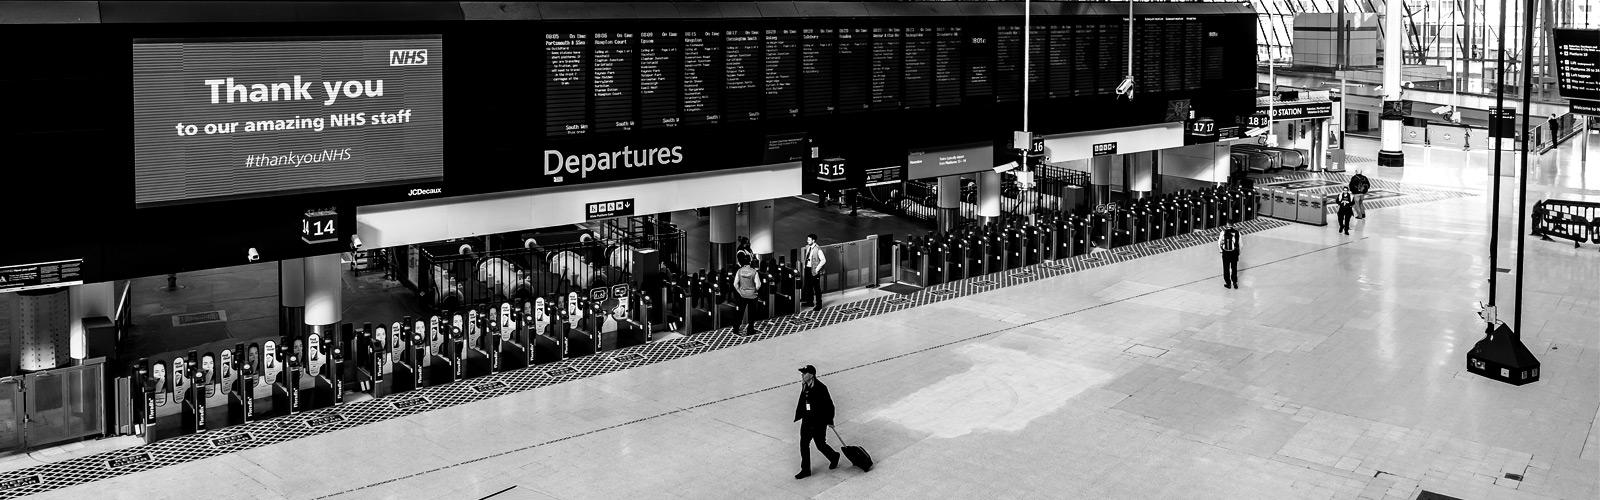 UK Lockdown Train Station